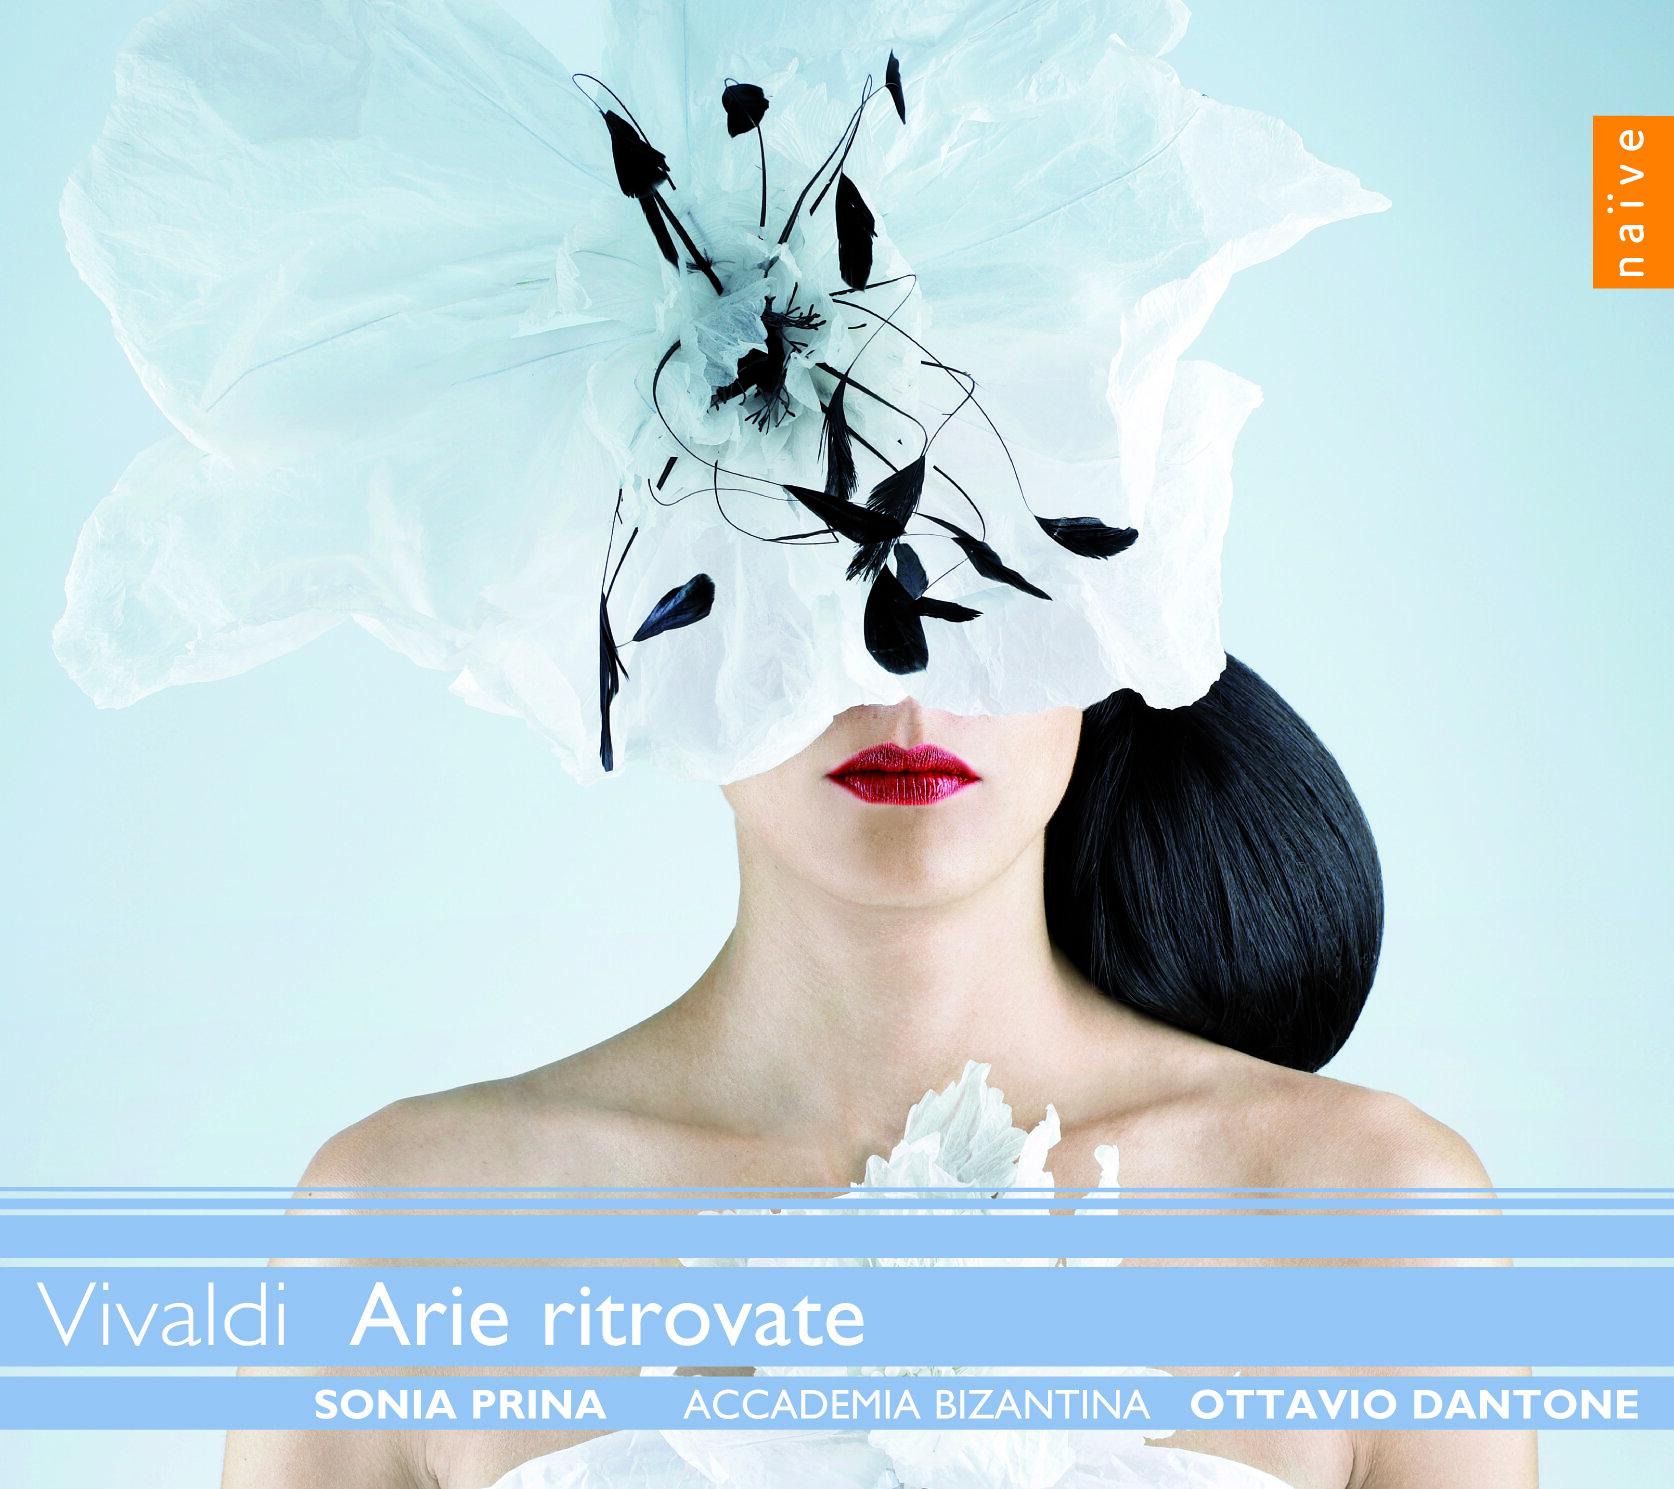 30- OP30443 Vivaldi Arie ritrovate.jpg